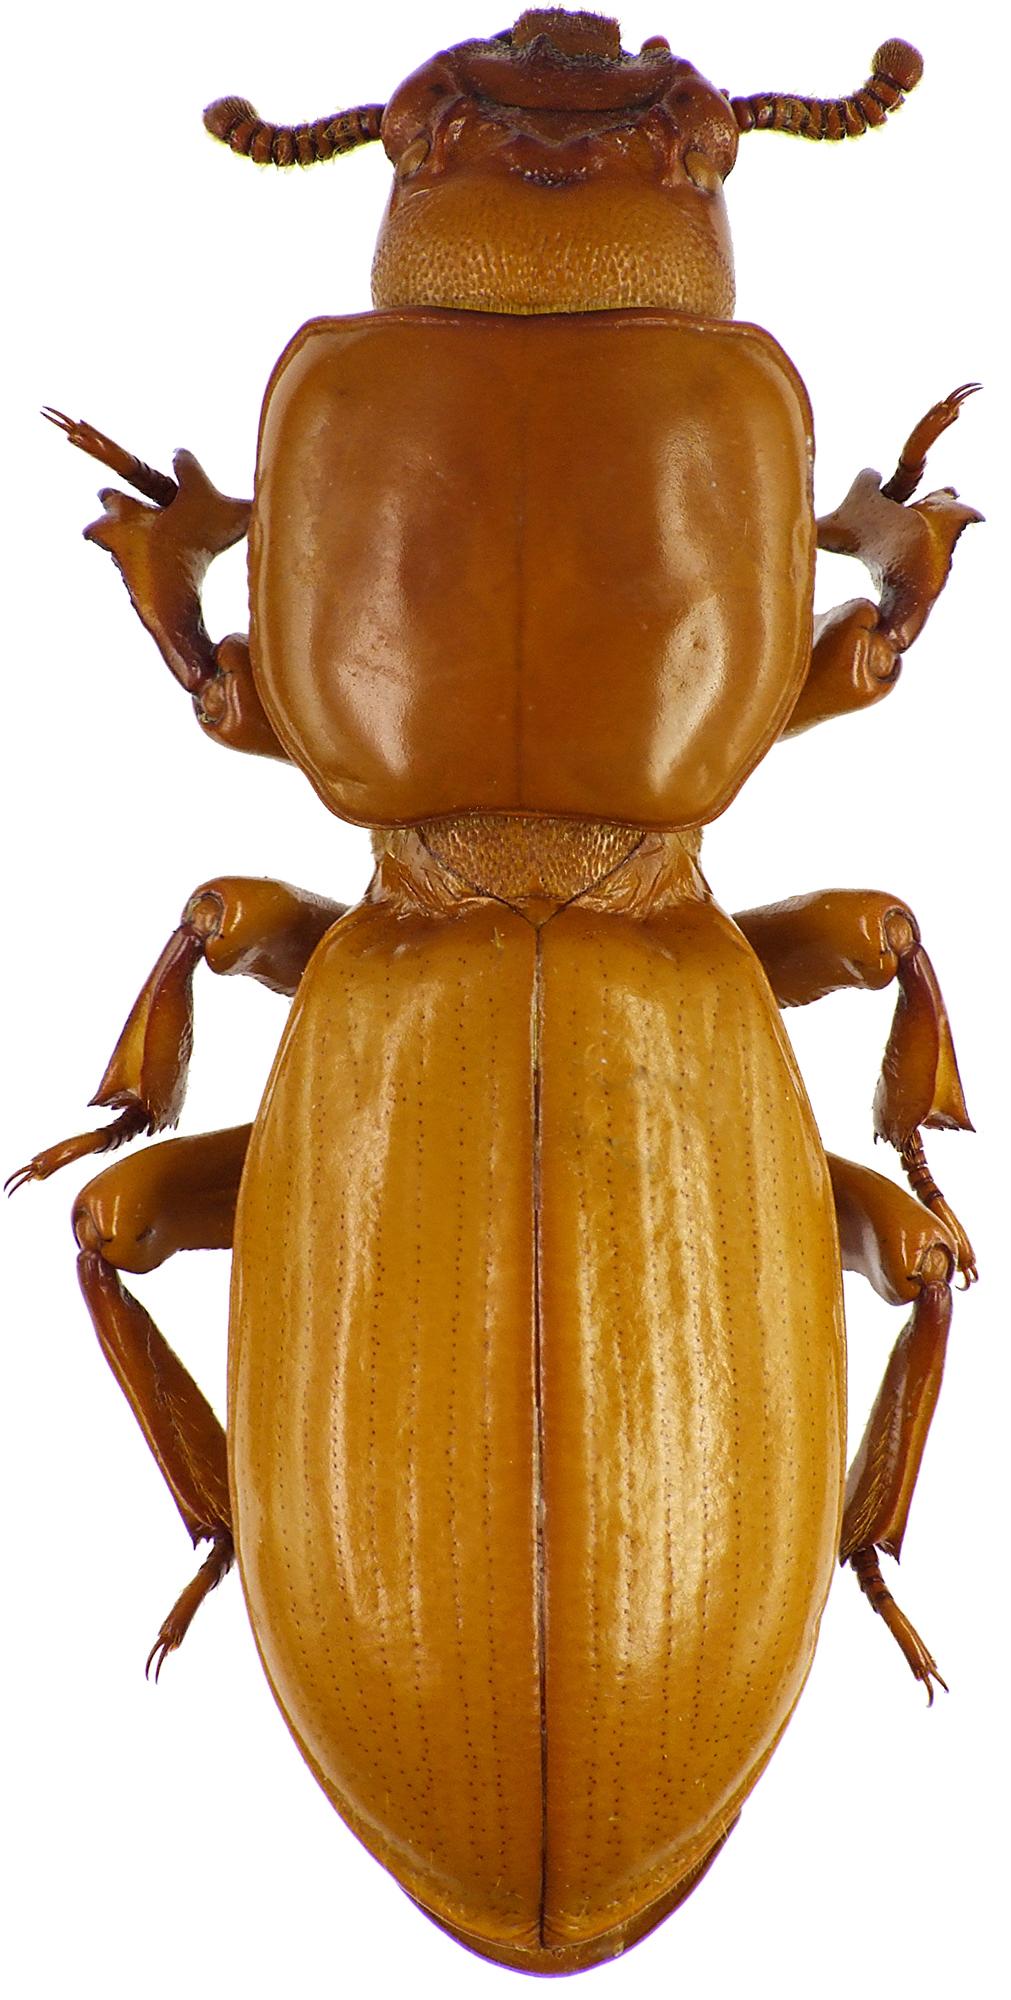 Passalocharis leleupi 71497cz09.jpg